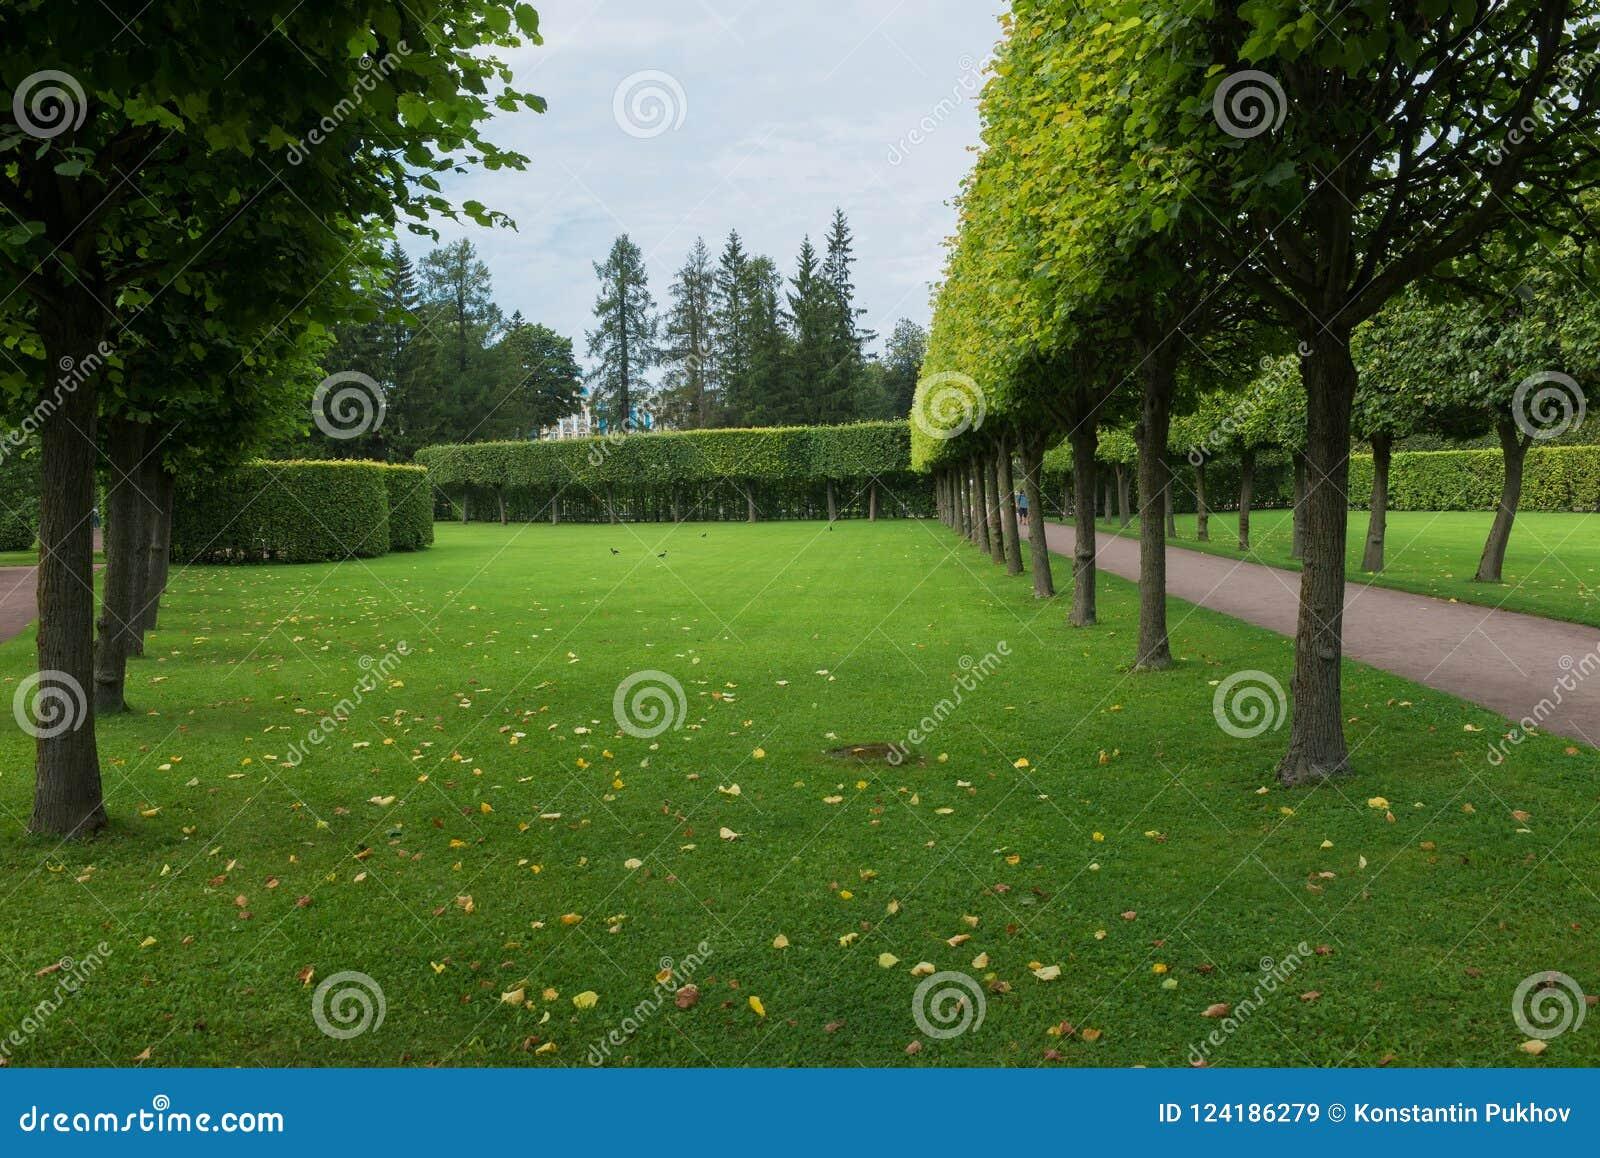 Geometrie im Park